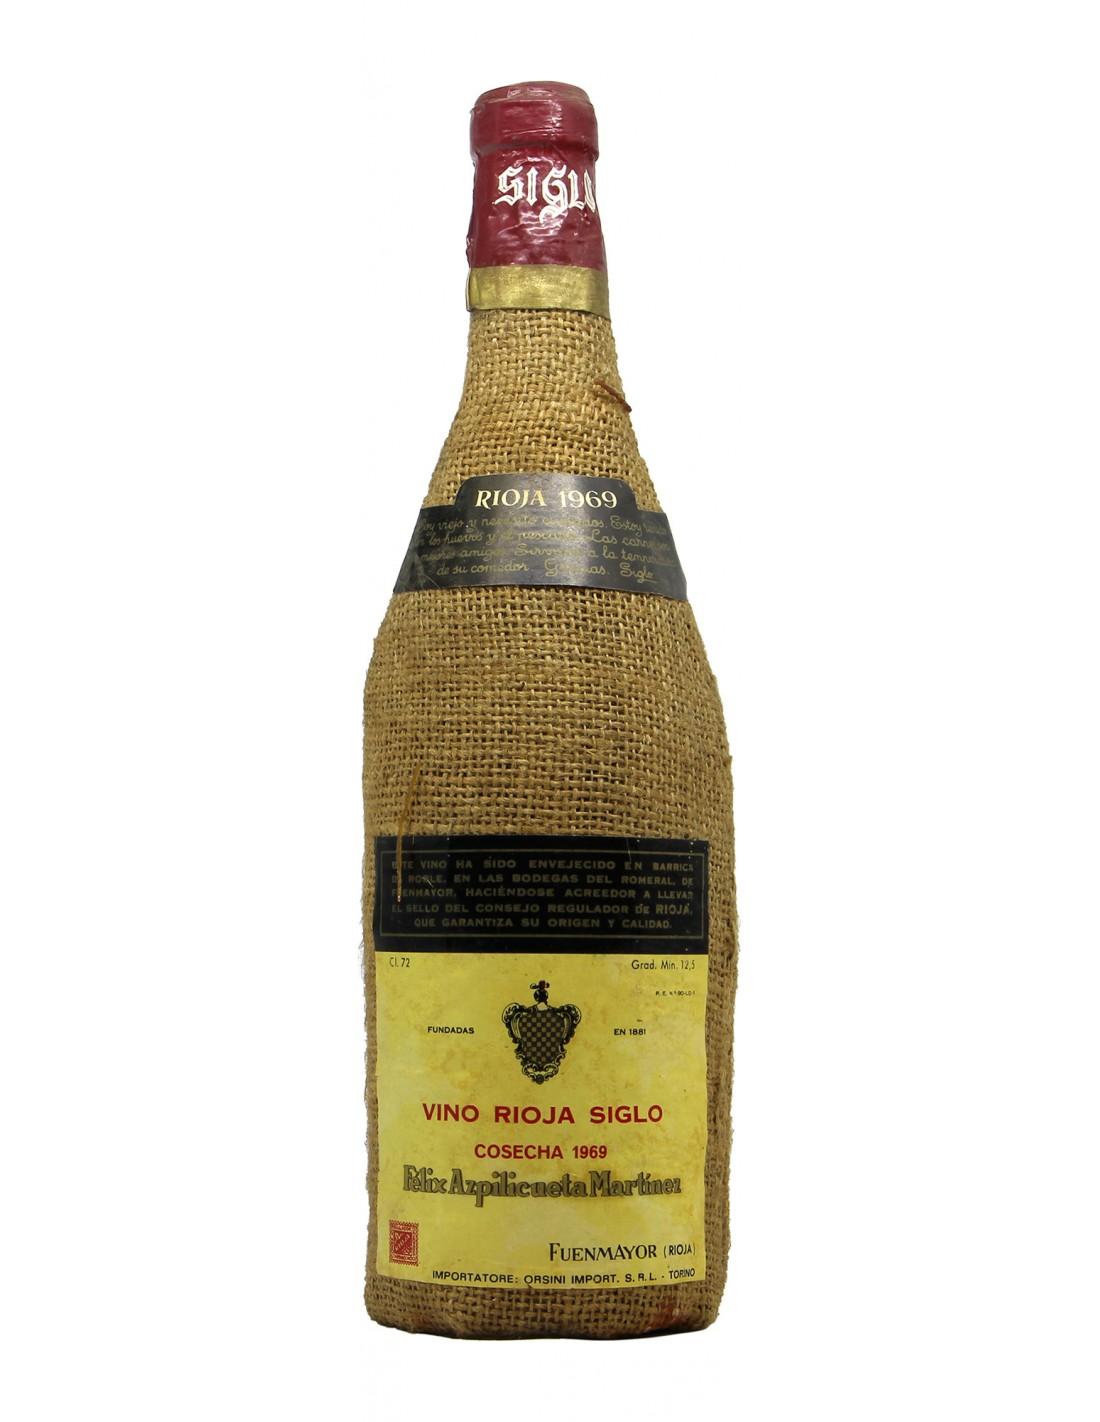 Rioja Siglo Cosecha 1969 FELIX AZPILICUETA MARTINEZ GRANDI